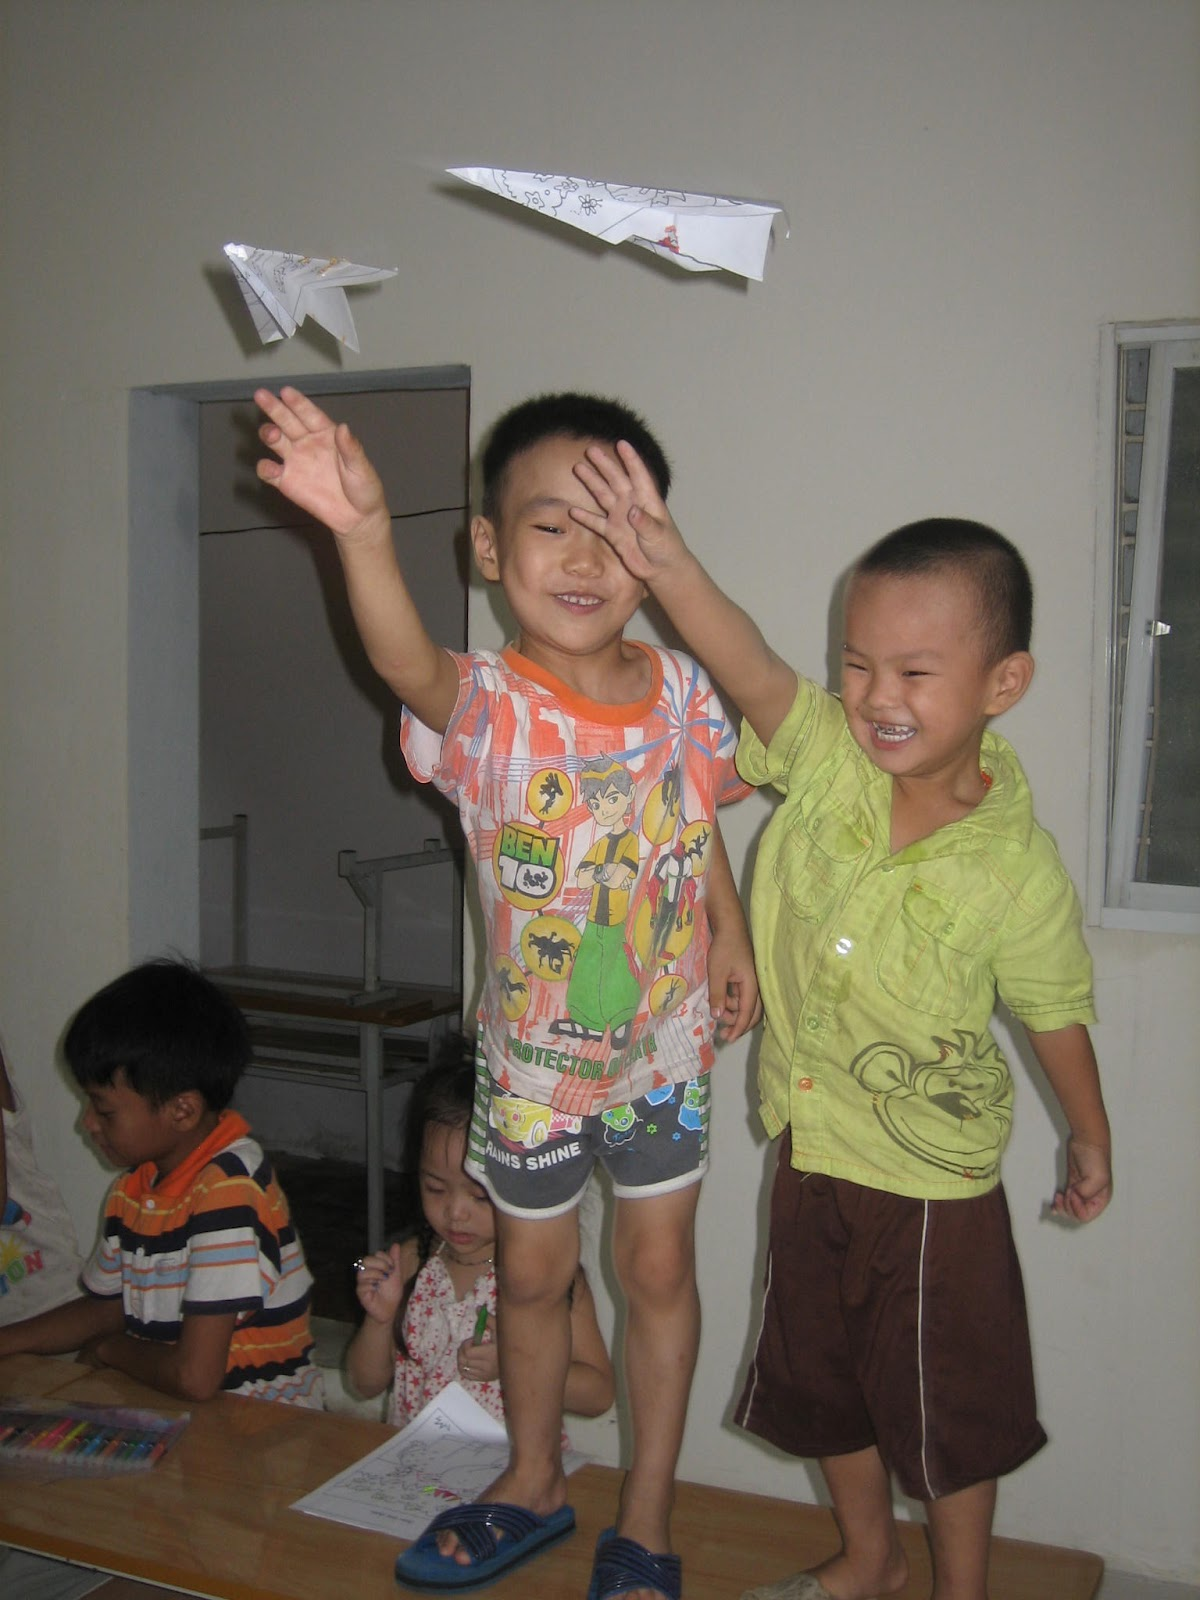 Vietnam 2012: Bo De Pagoden - vores arbejde de næste 4 uger